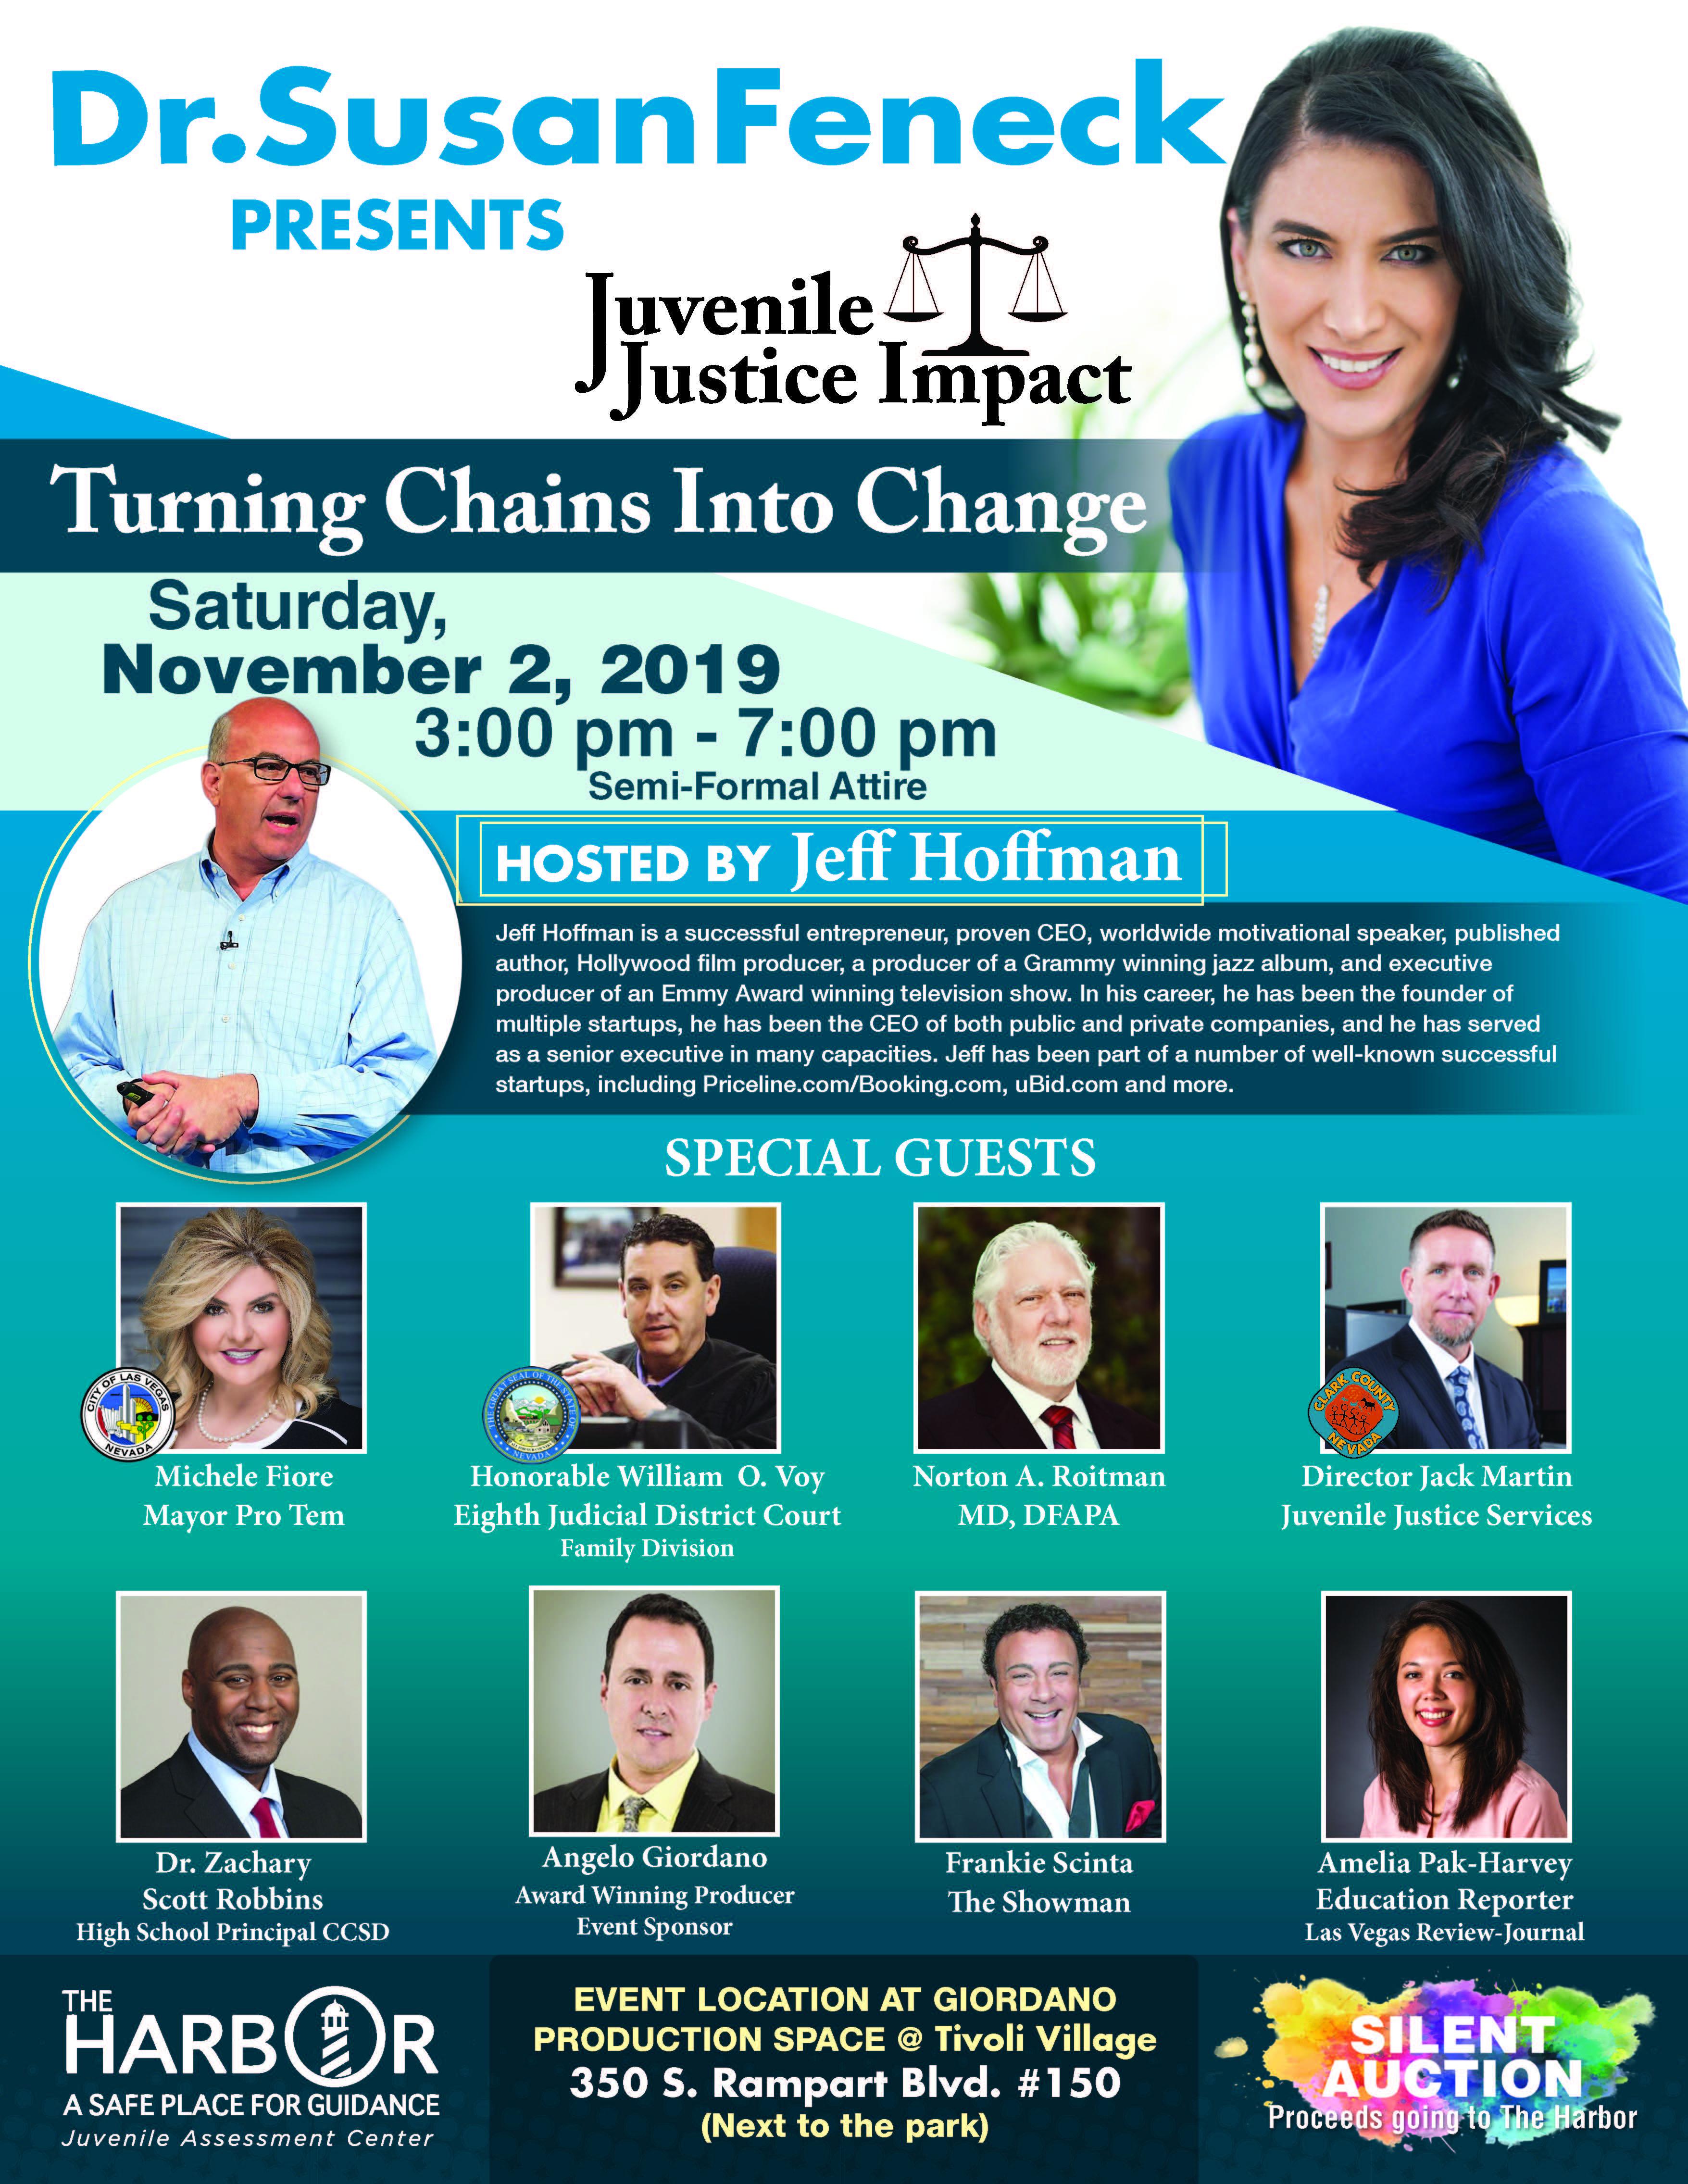 2019 JJI Guest Panel Speakers